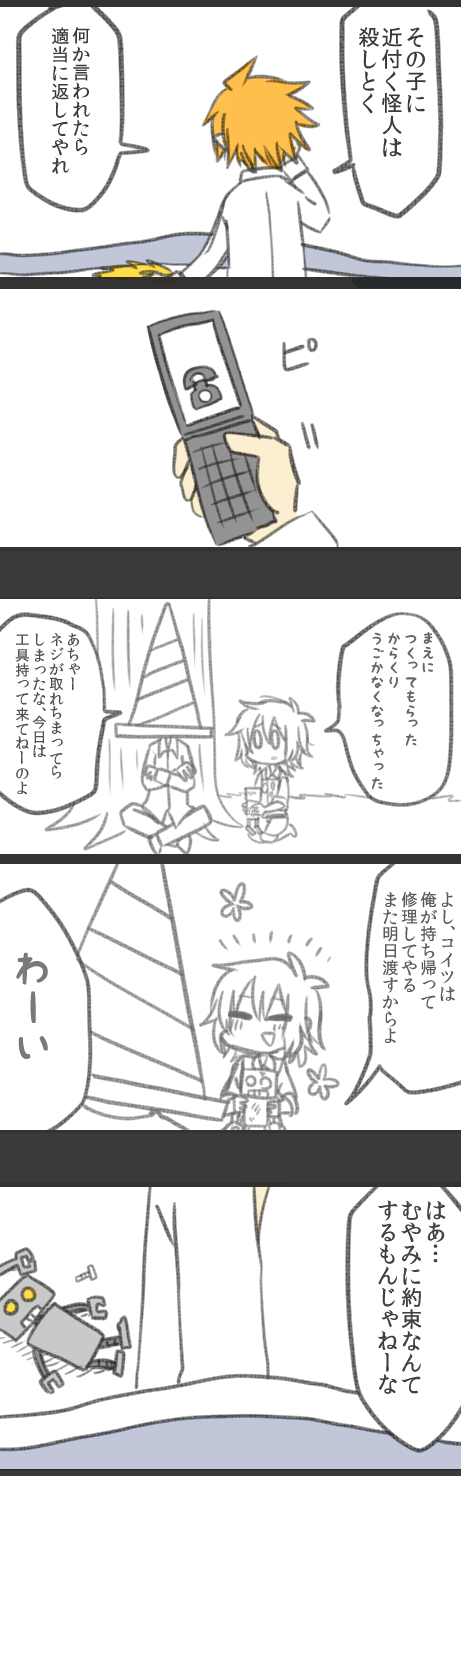 sankaku8